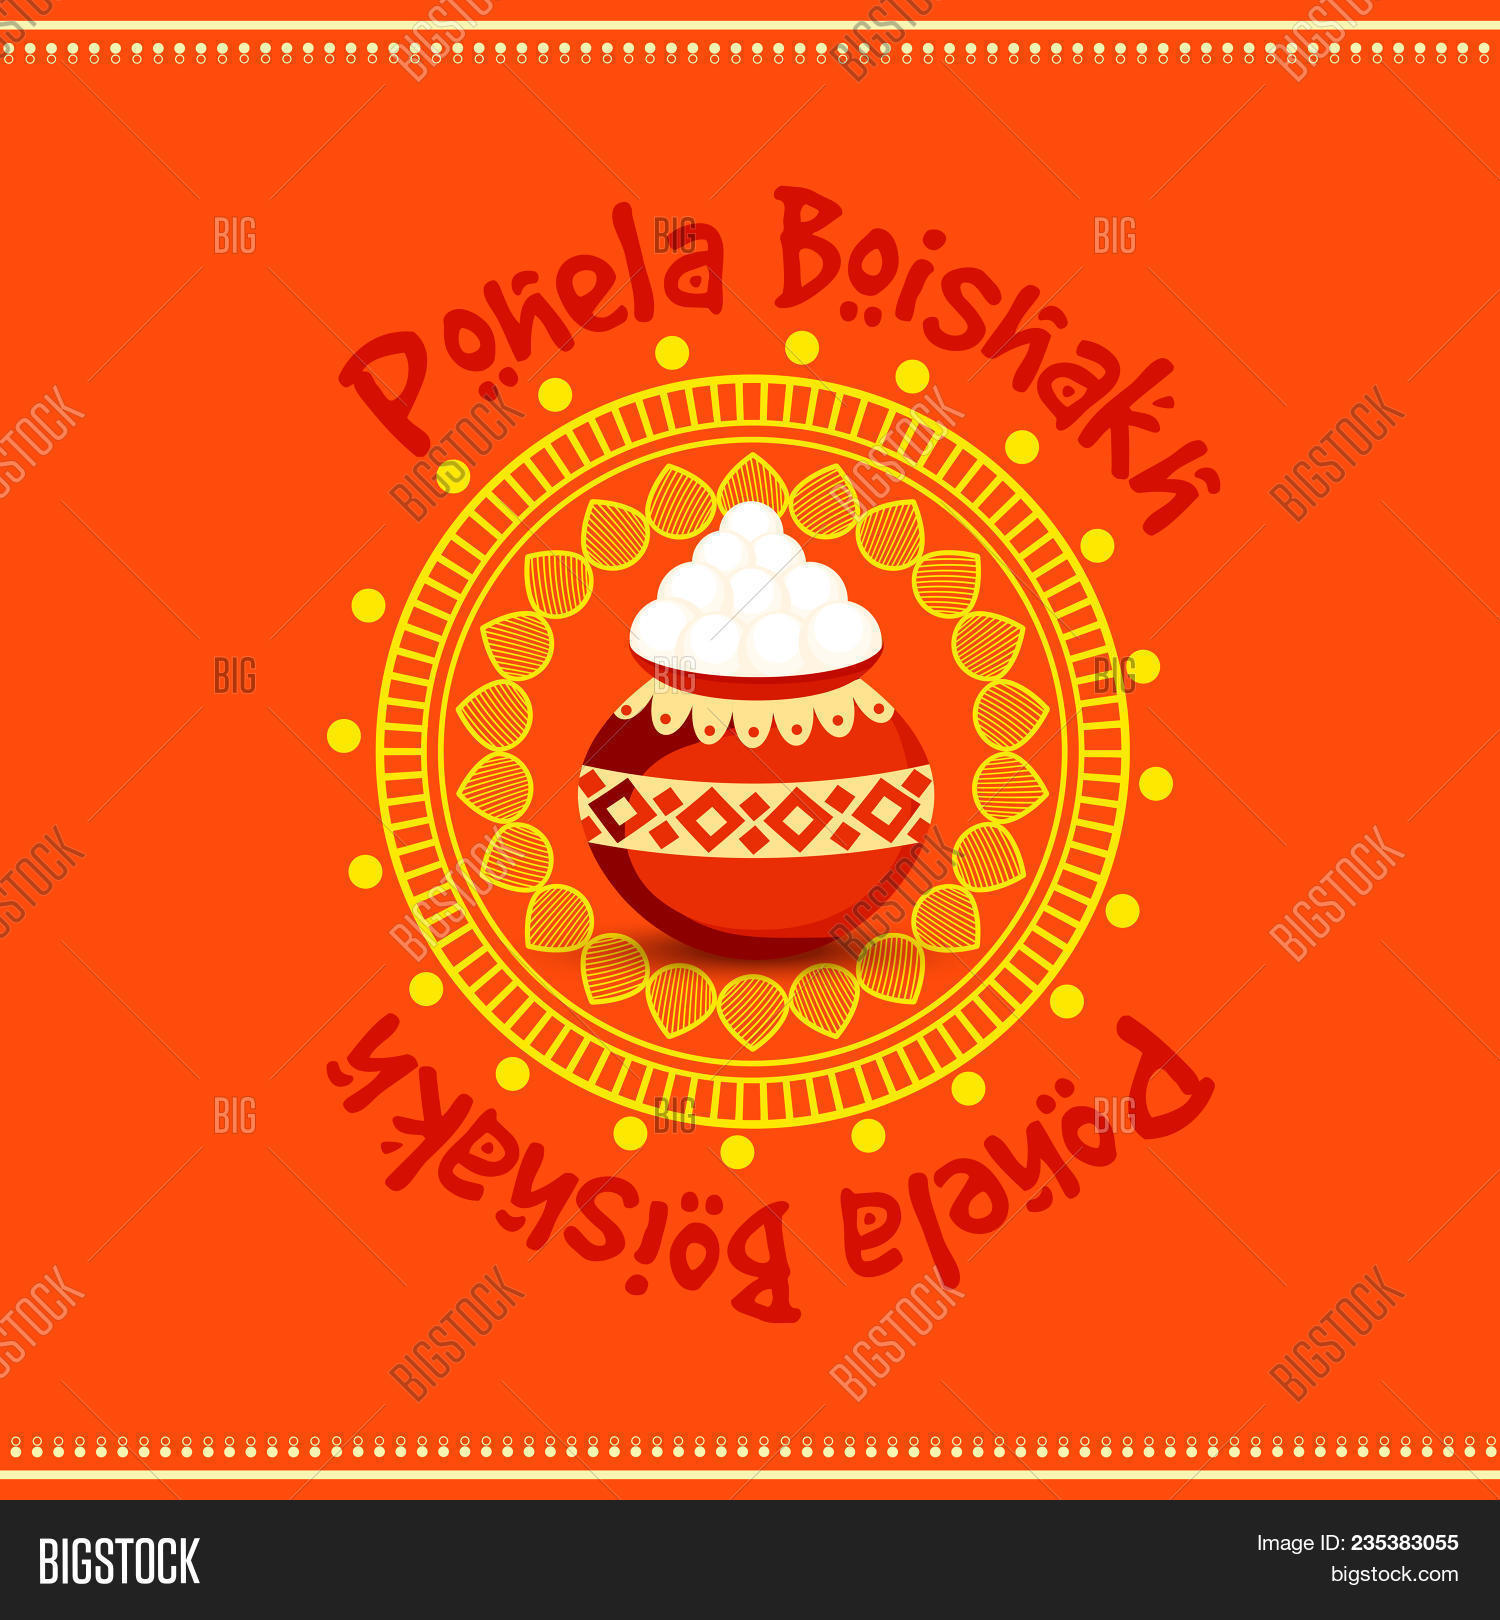 poster or banner of bengali new year pohela boishakh greeting card background